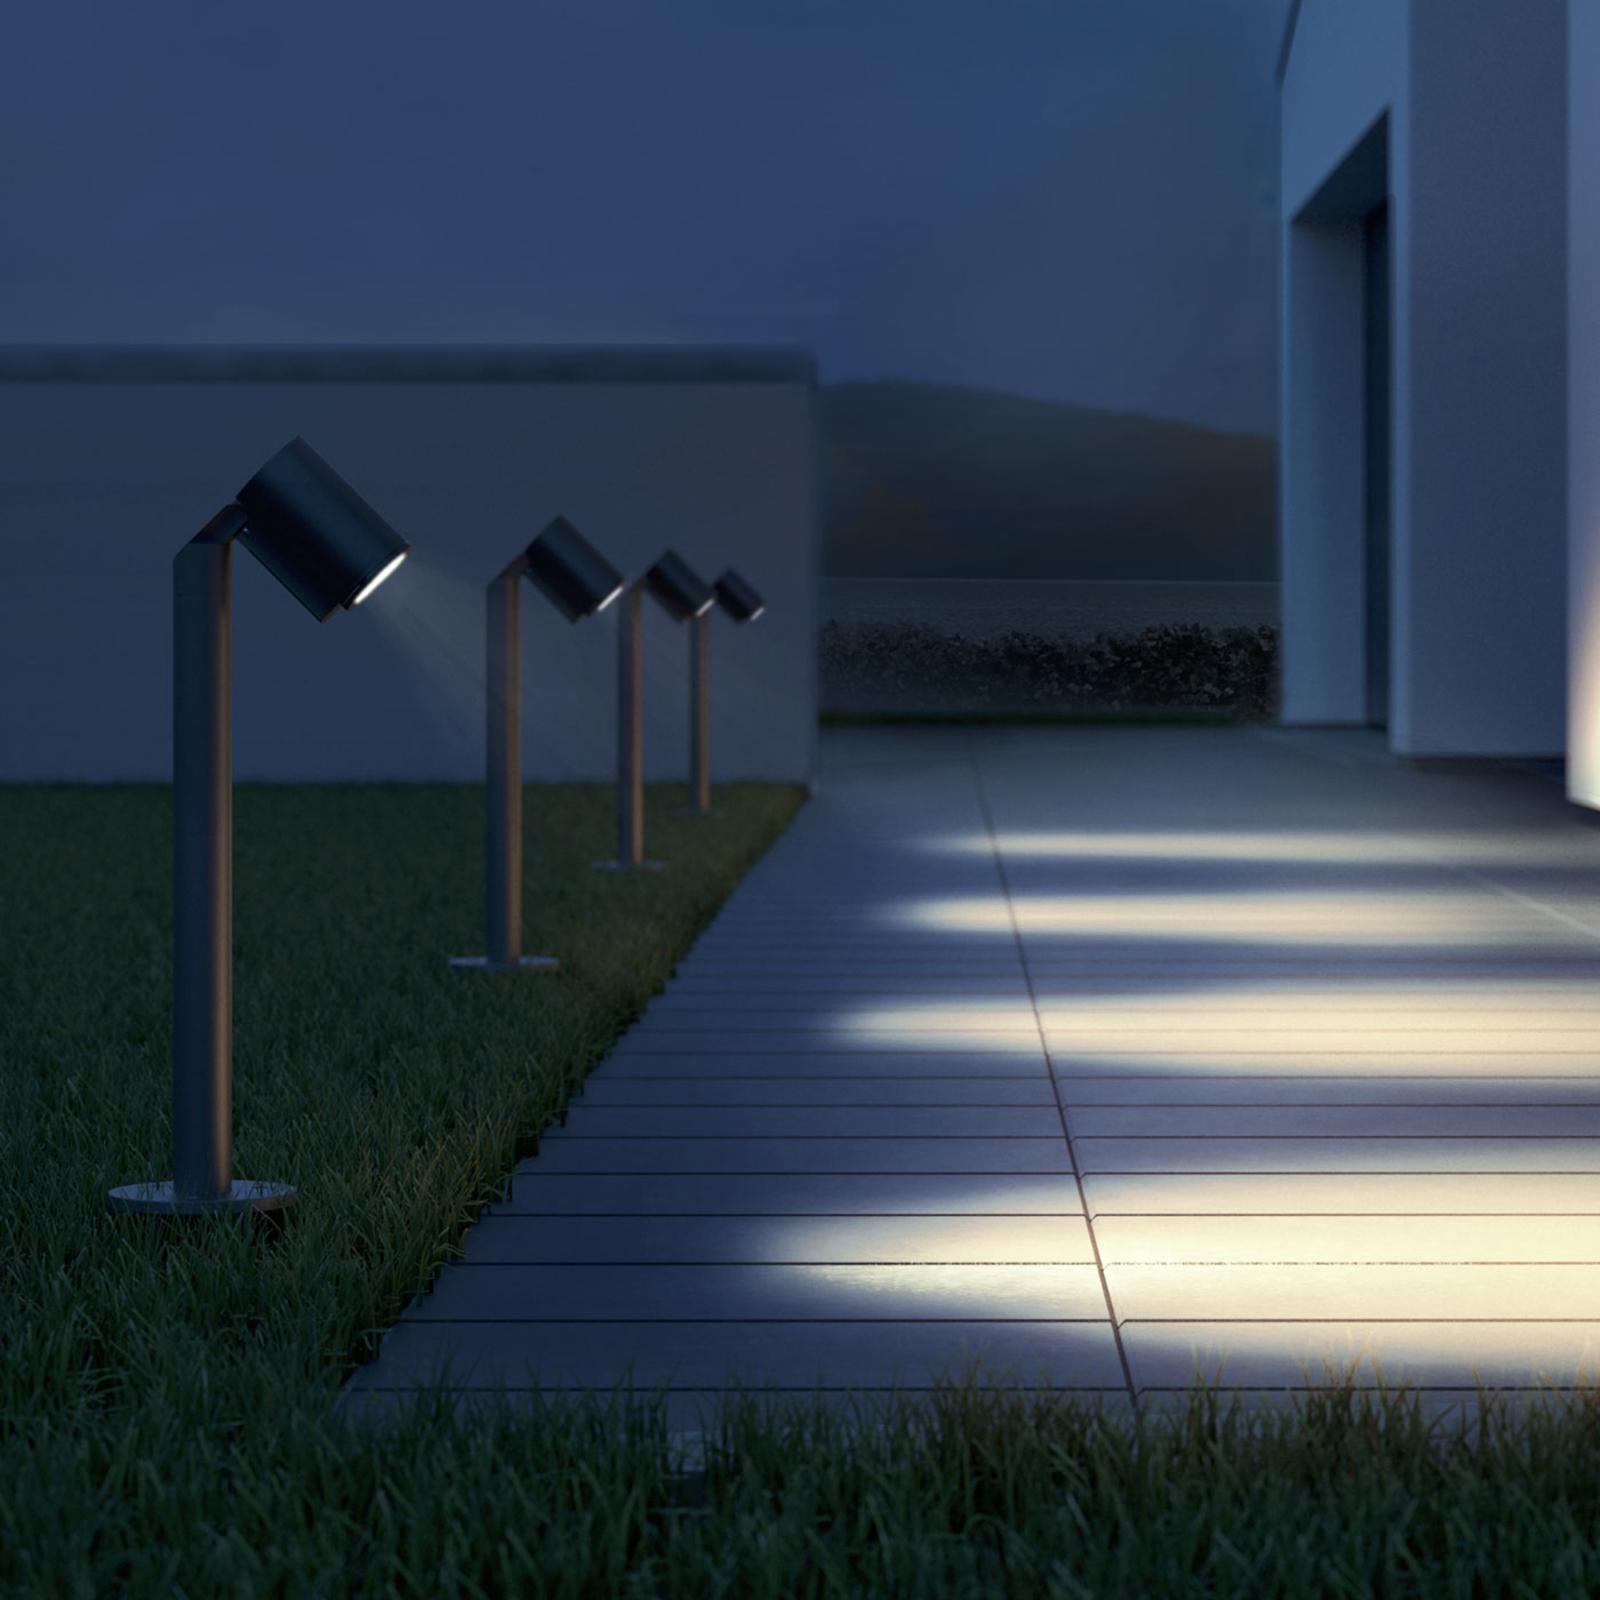 Steinel Spot Way LED tuinpadverlichting, Slave